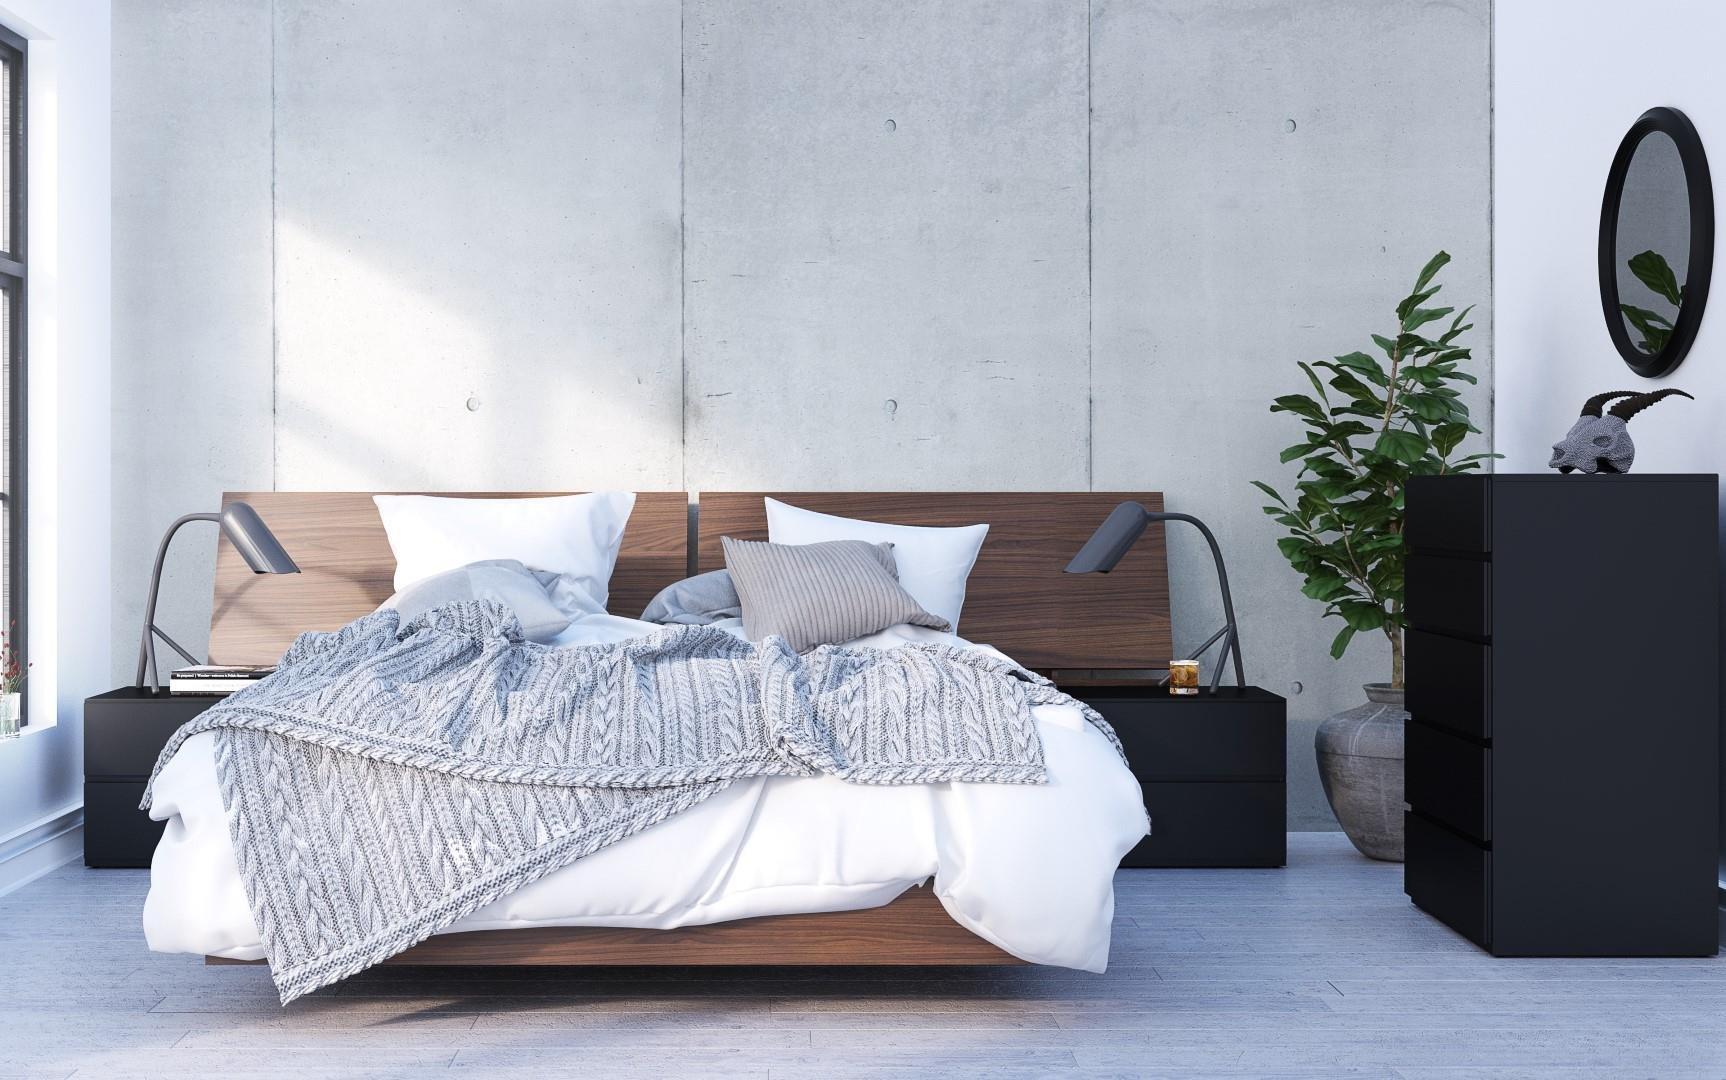 Nexera Sonoma 5 Piece Queen Size Bedroom Set Walnut and Black